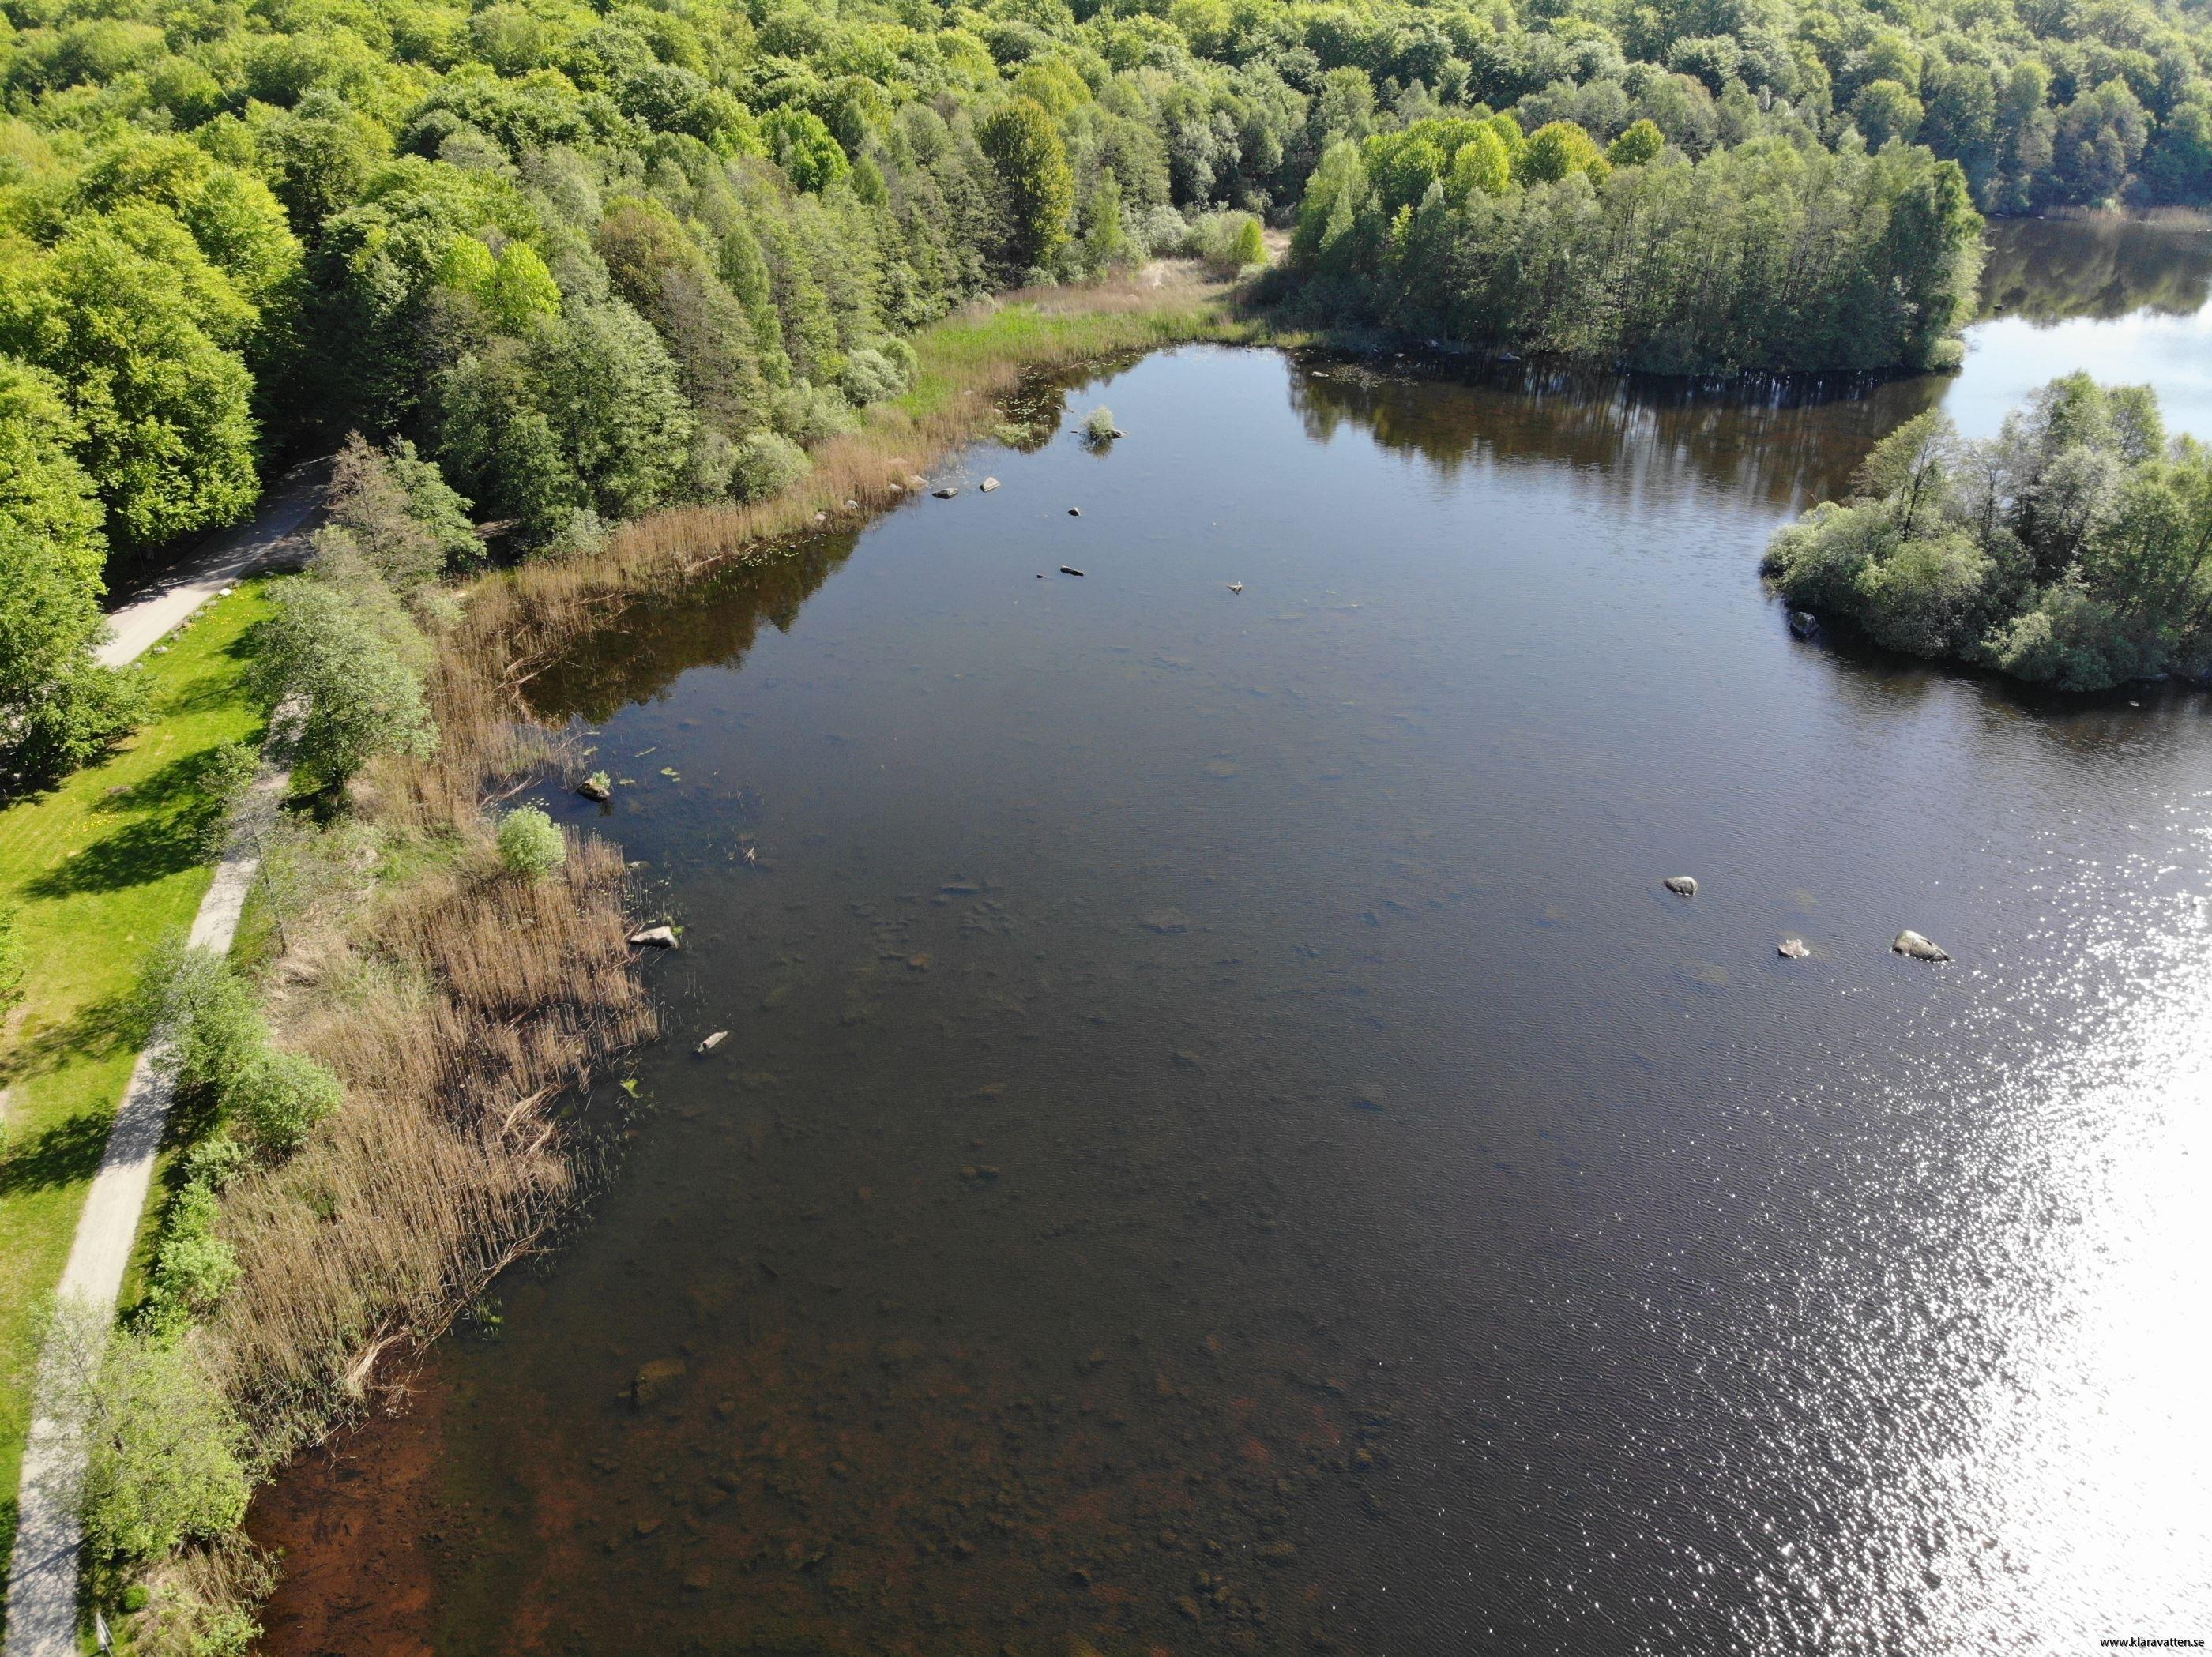 Cykling: Södra Bergundasjön, 11 km